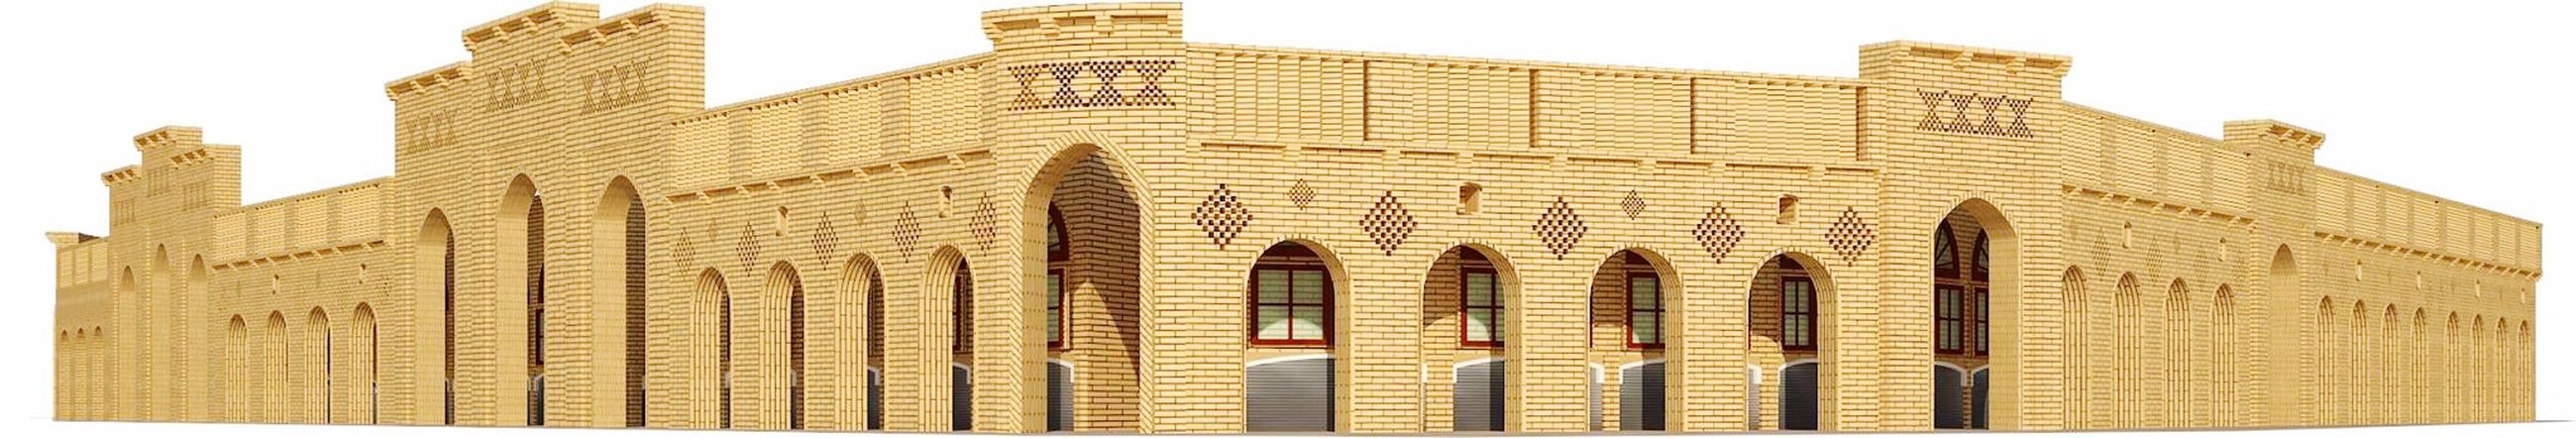 ARCHITECT Architecture Kurdistan RePicture Growth Architects Architecture_collection Erbil City Citadel Erbil